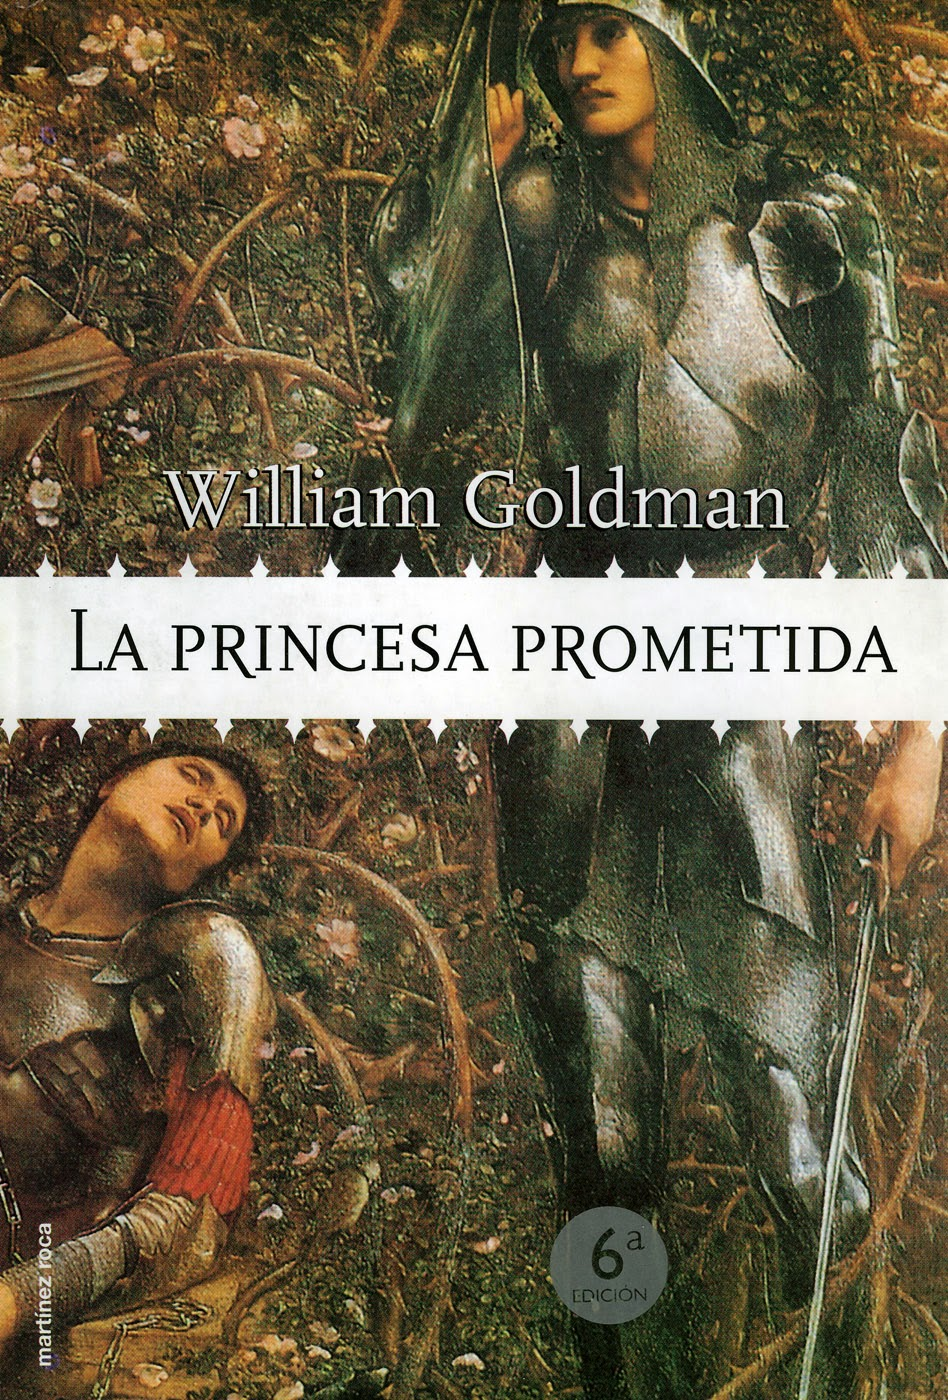 http://www.planetadelibros.com/la-princesa-prometida-libro-438.html